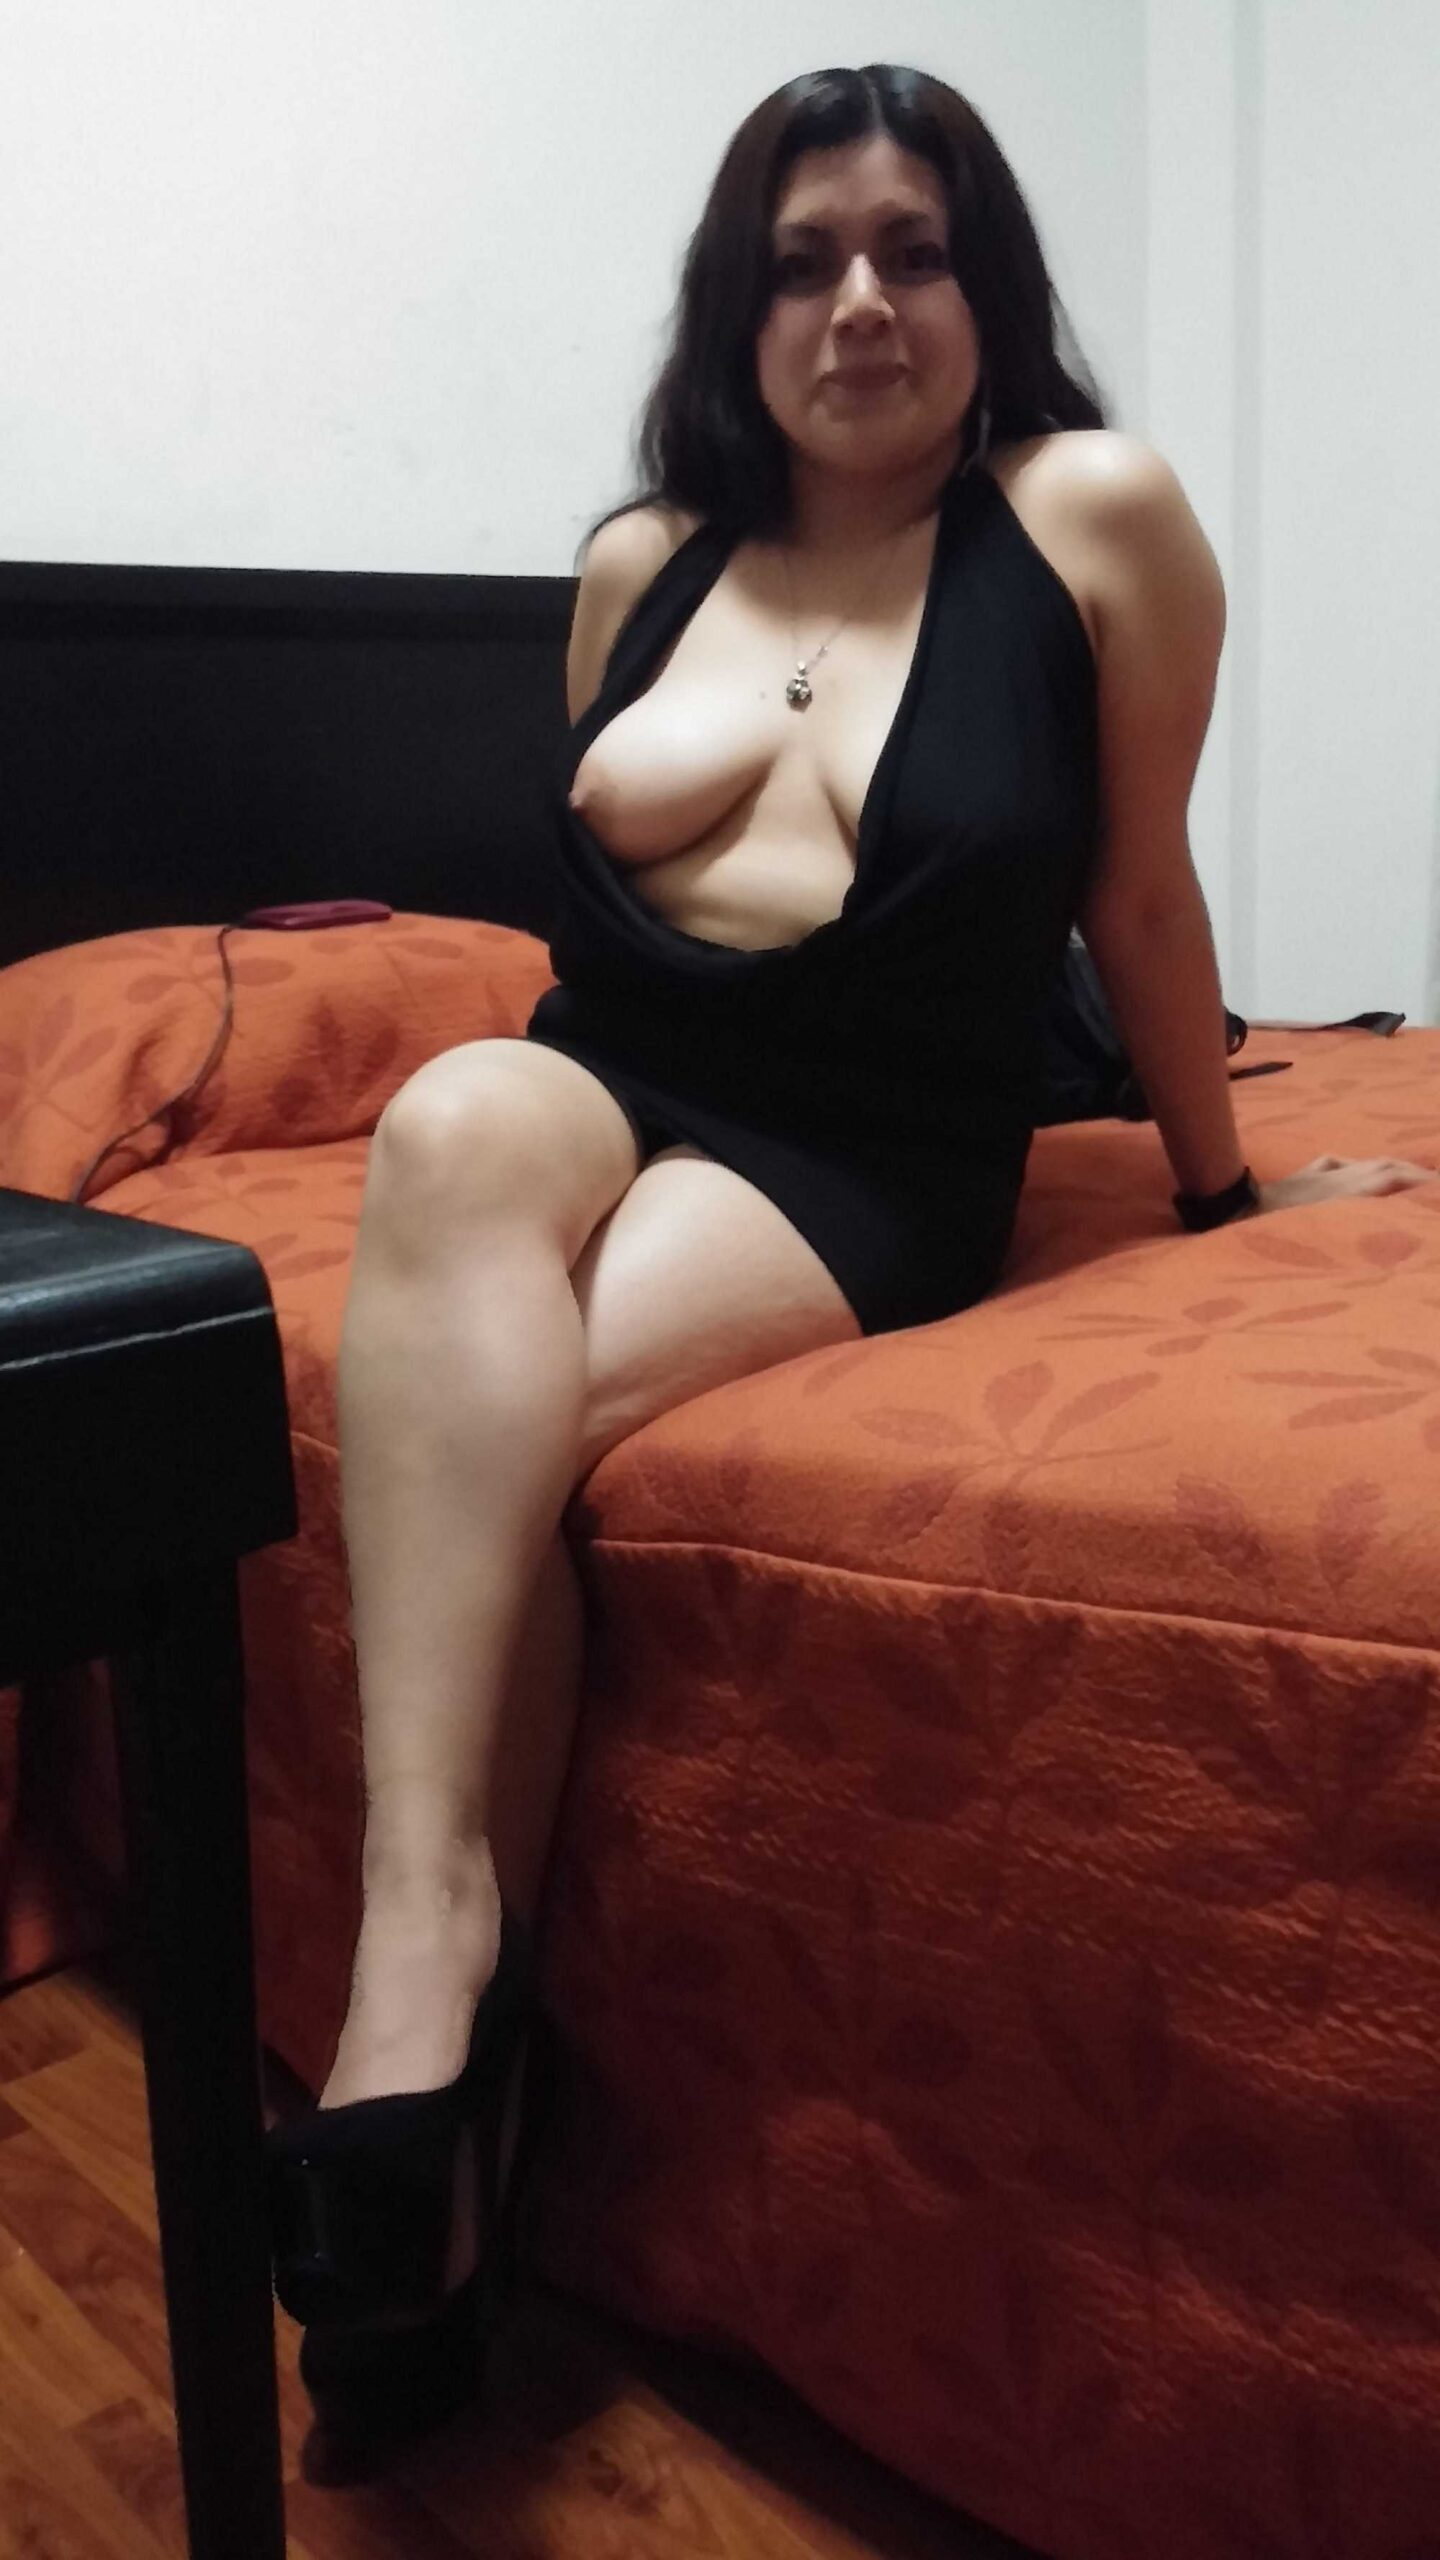 fotos esposas zorras, fotos de porno casero